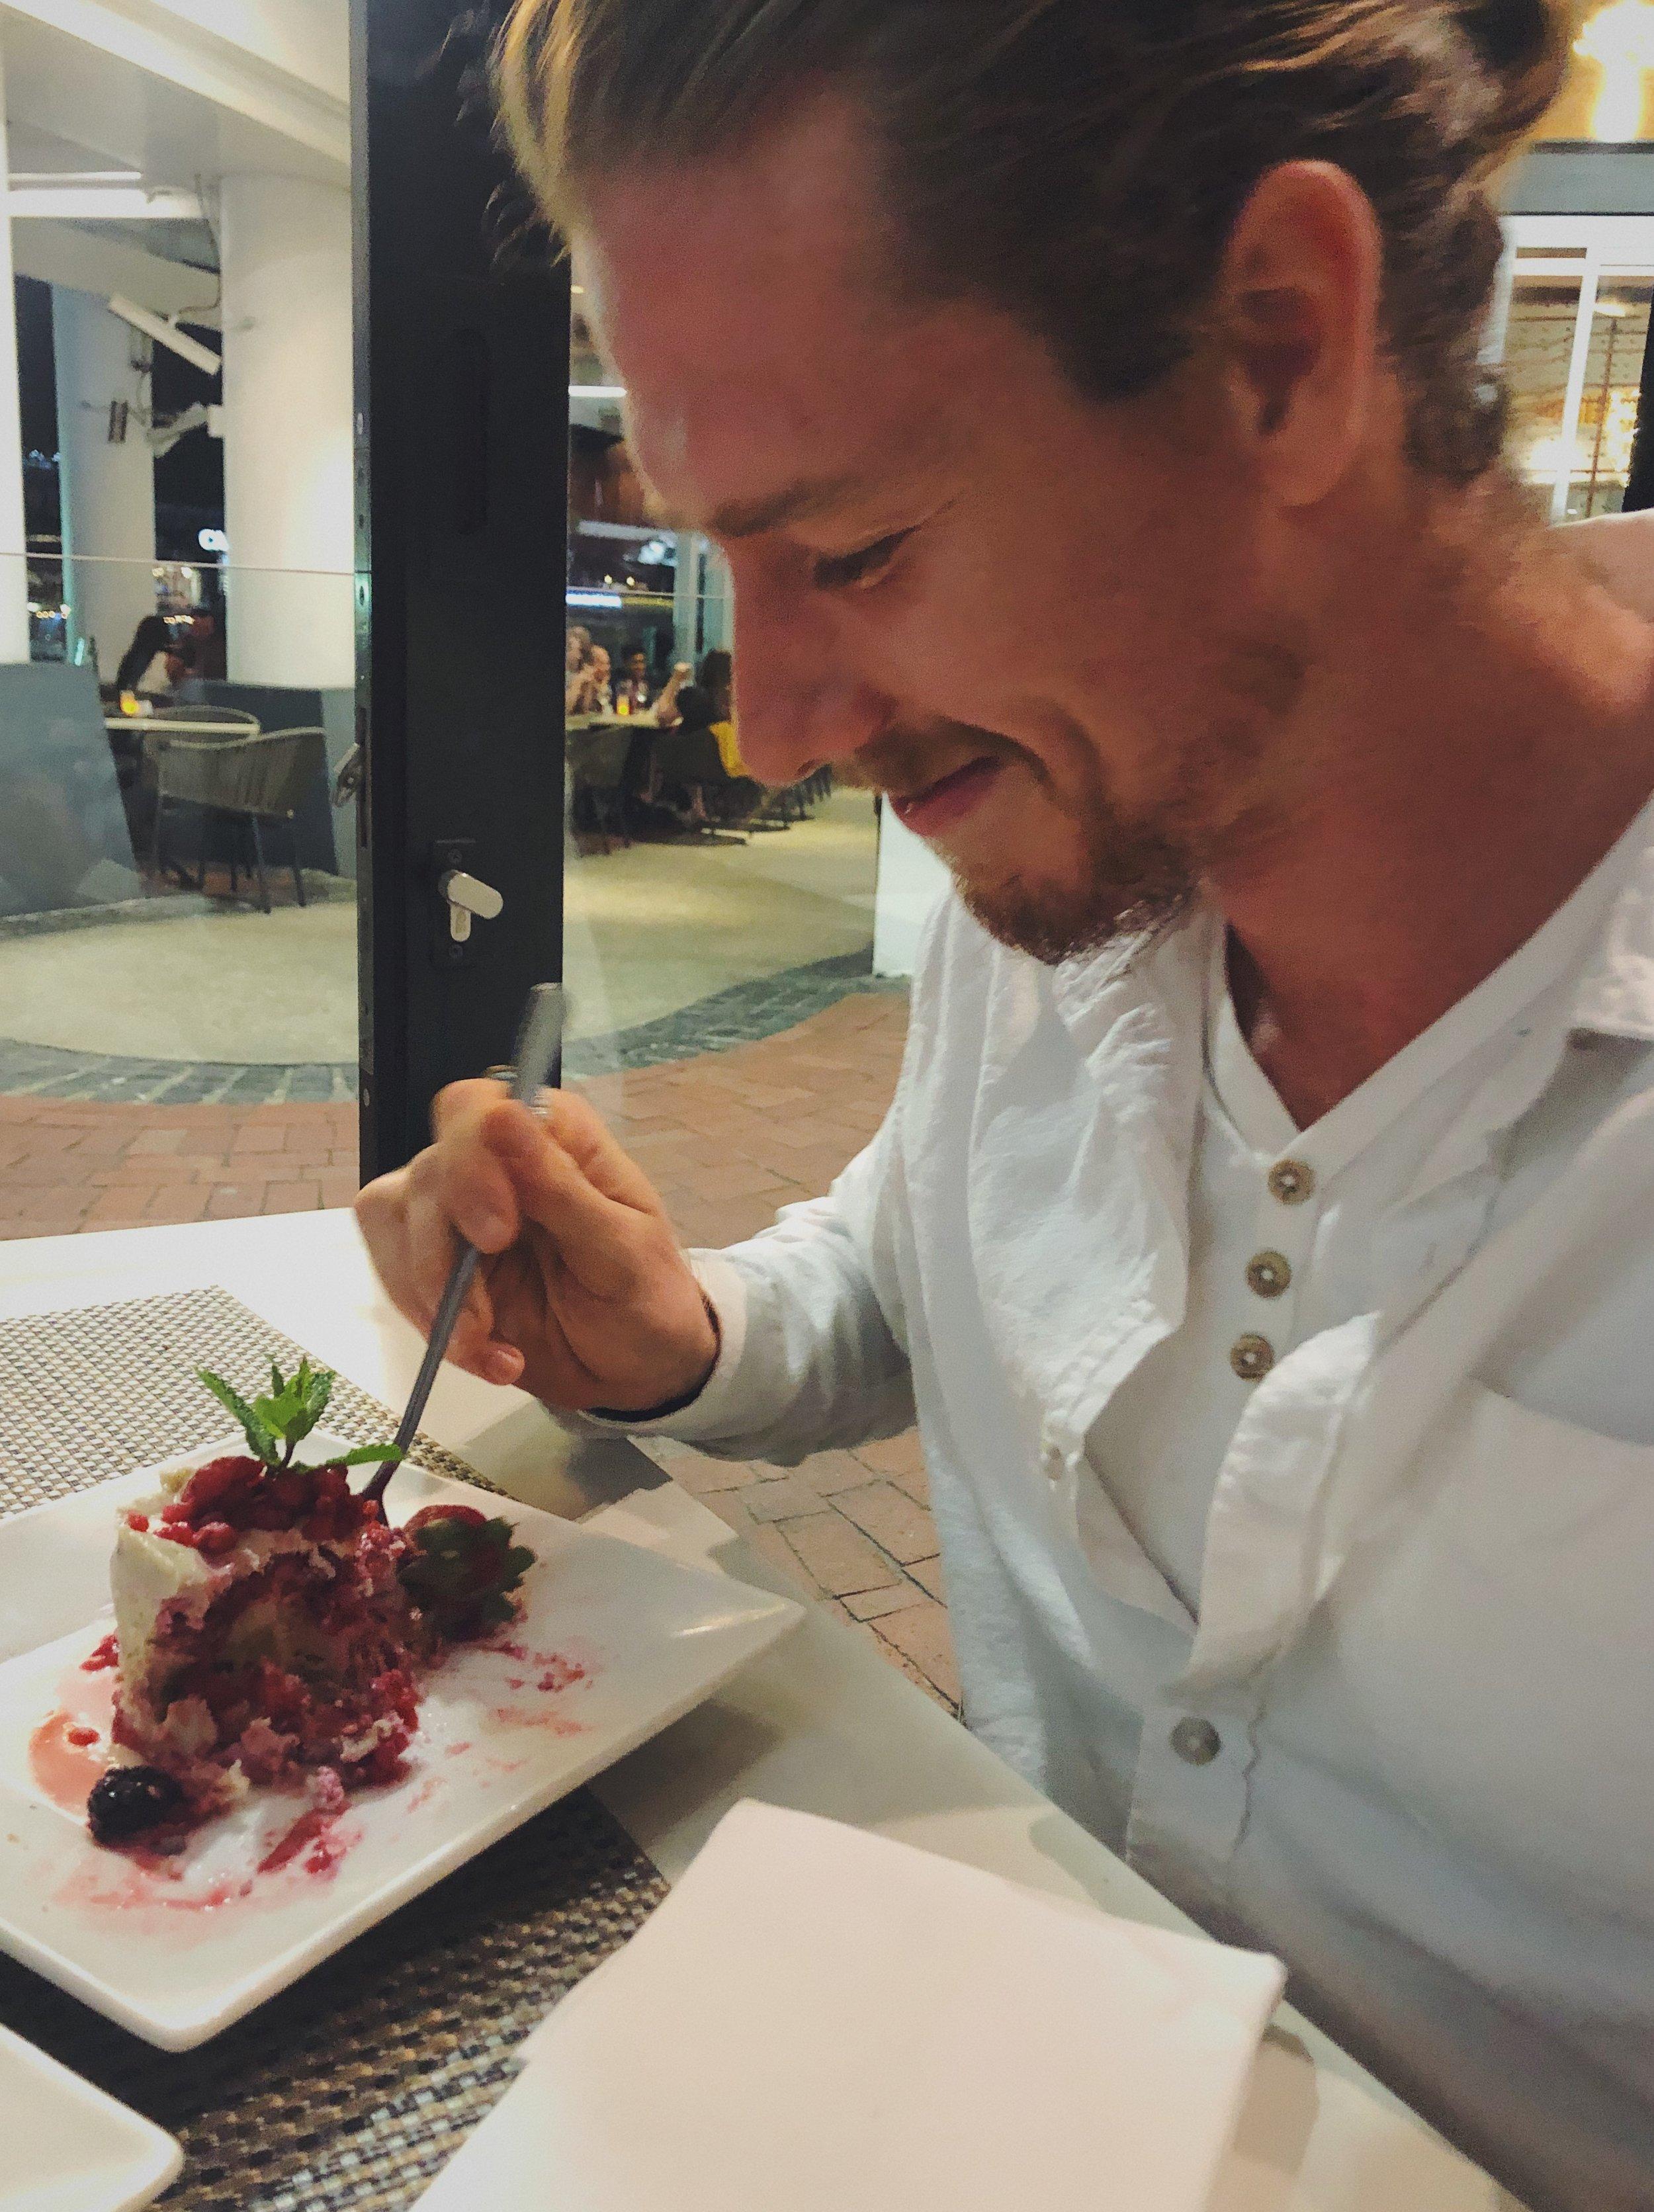 Human eating dessert <3